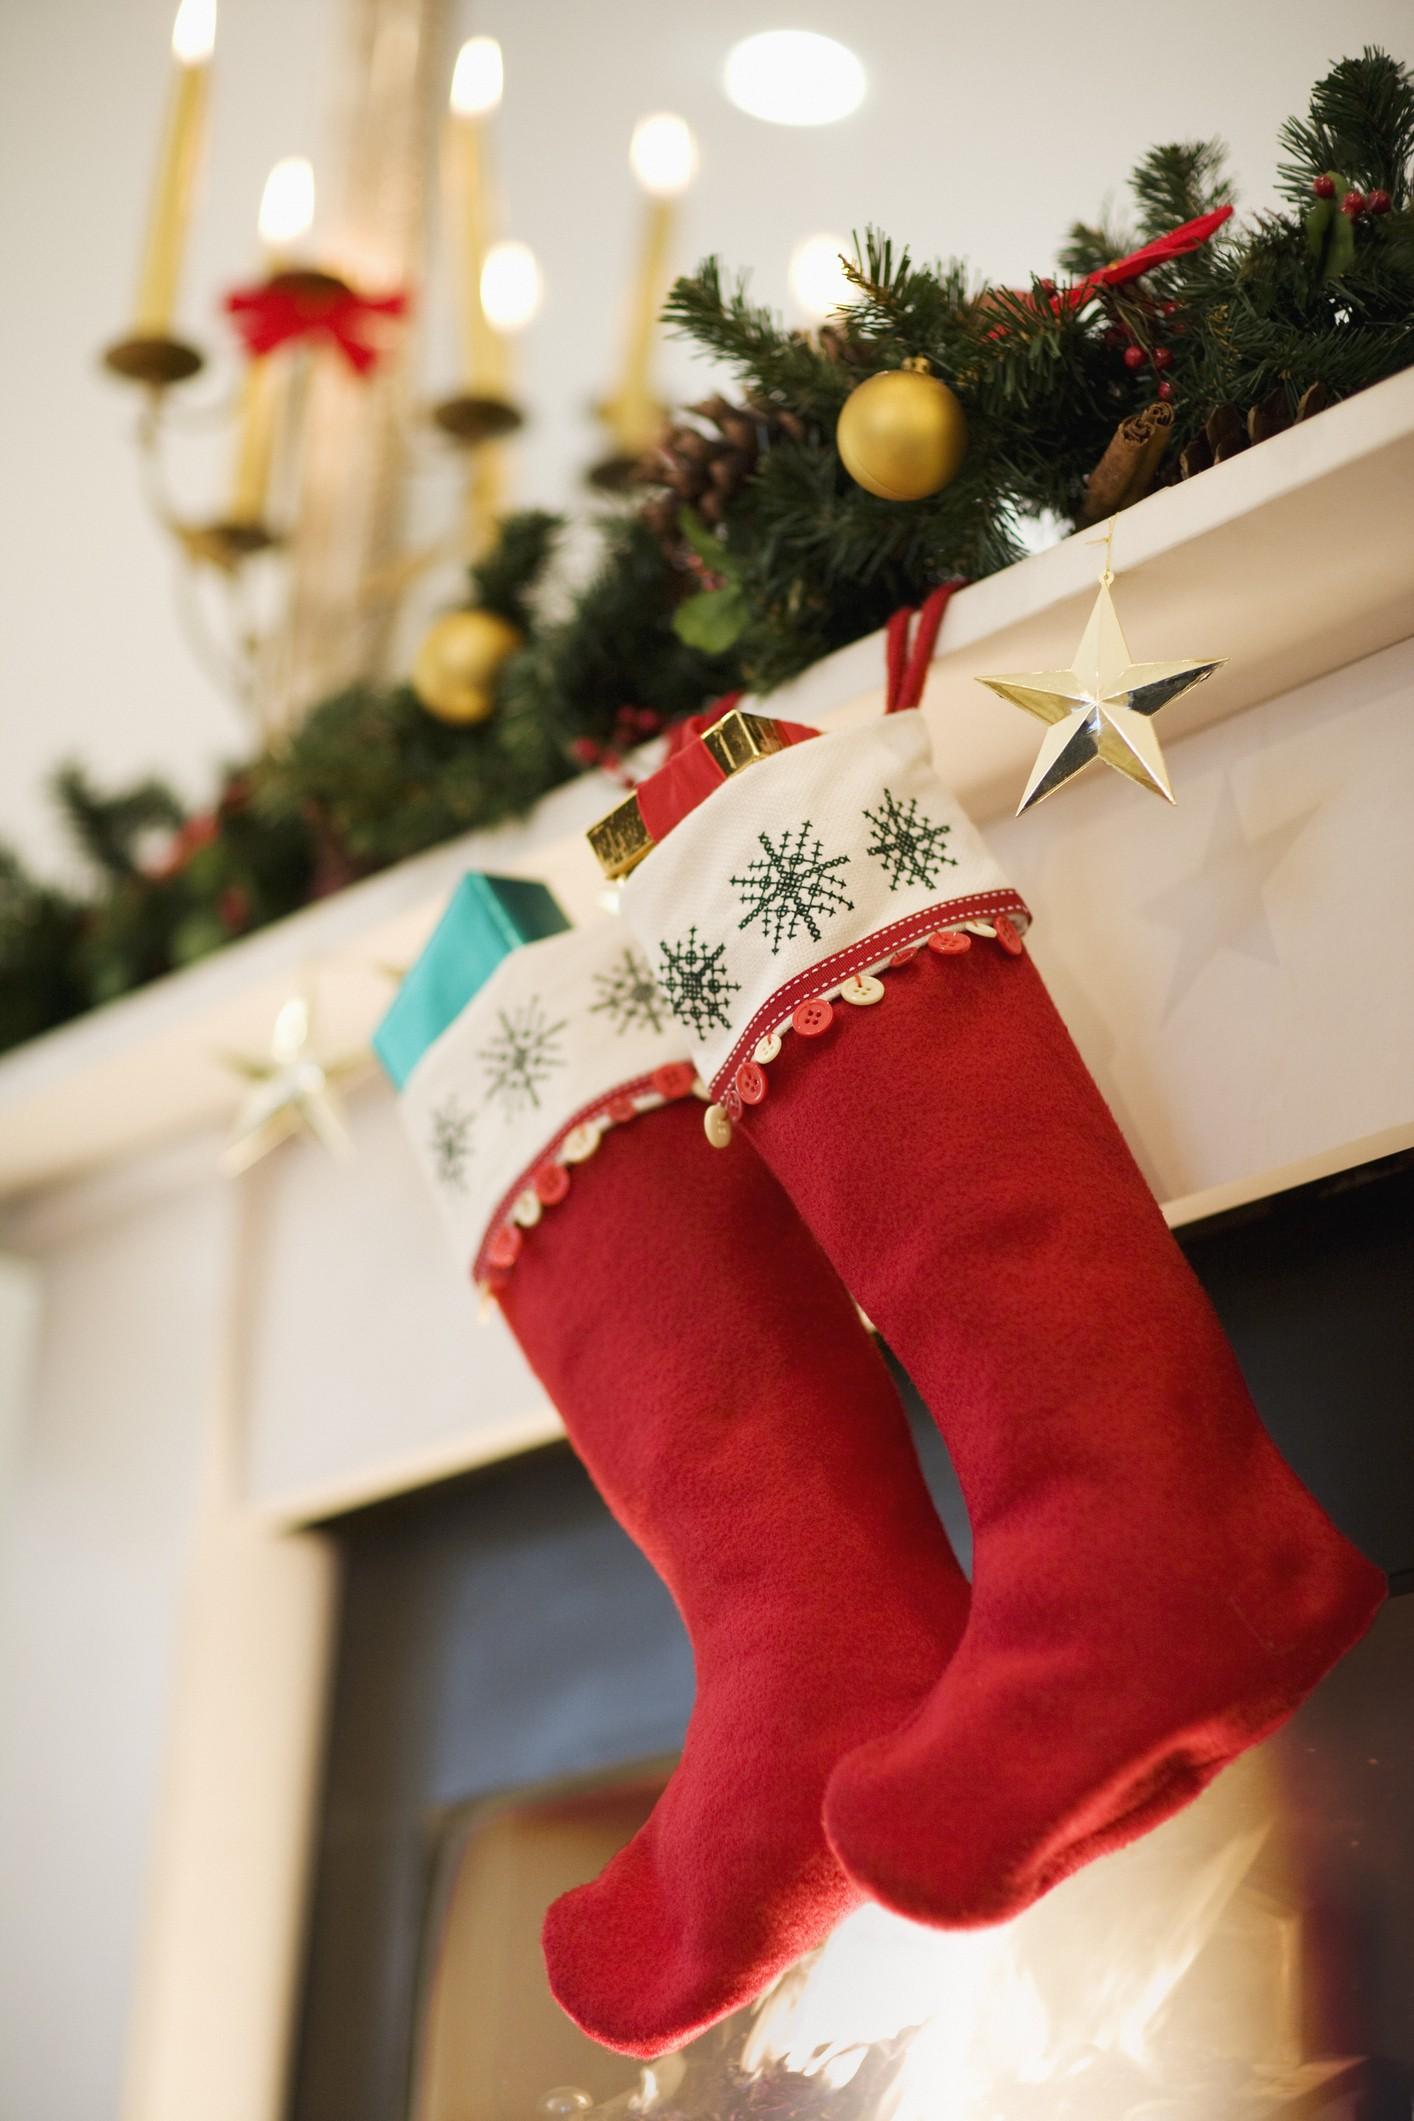 Christmas stockings hanging on fireplace mantel